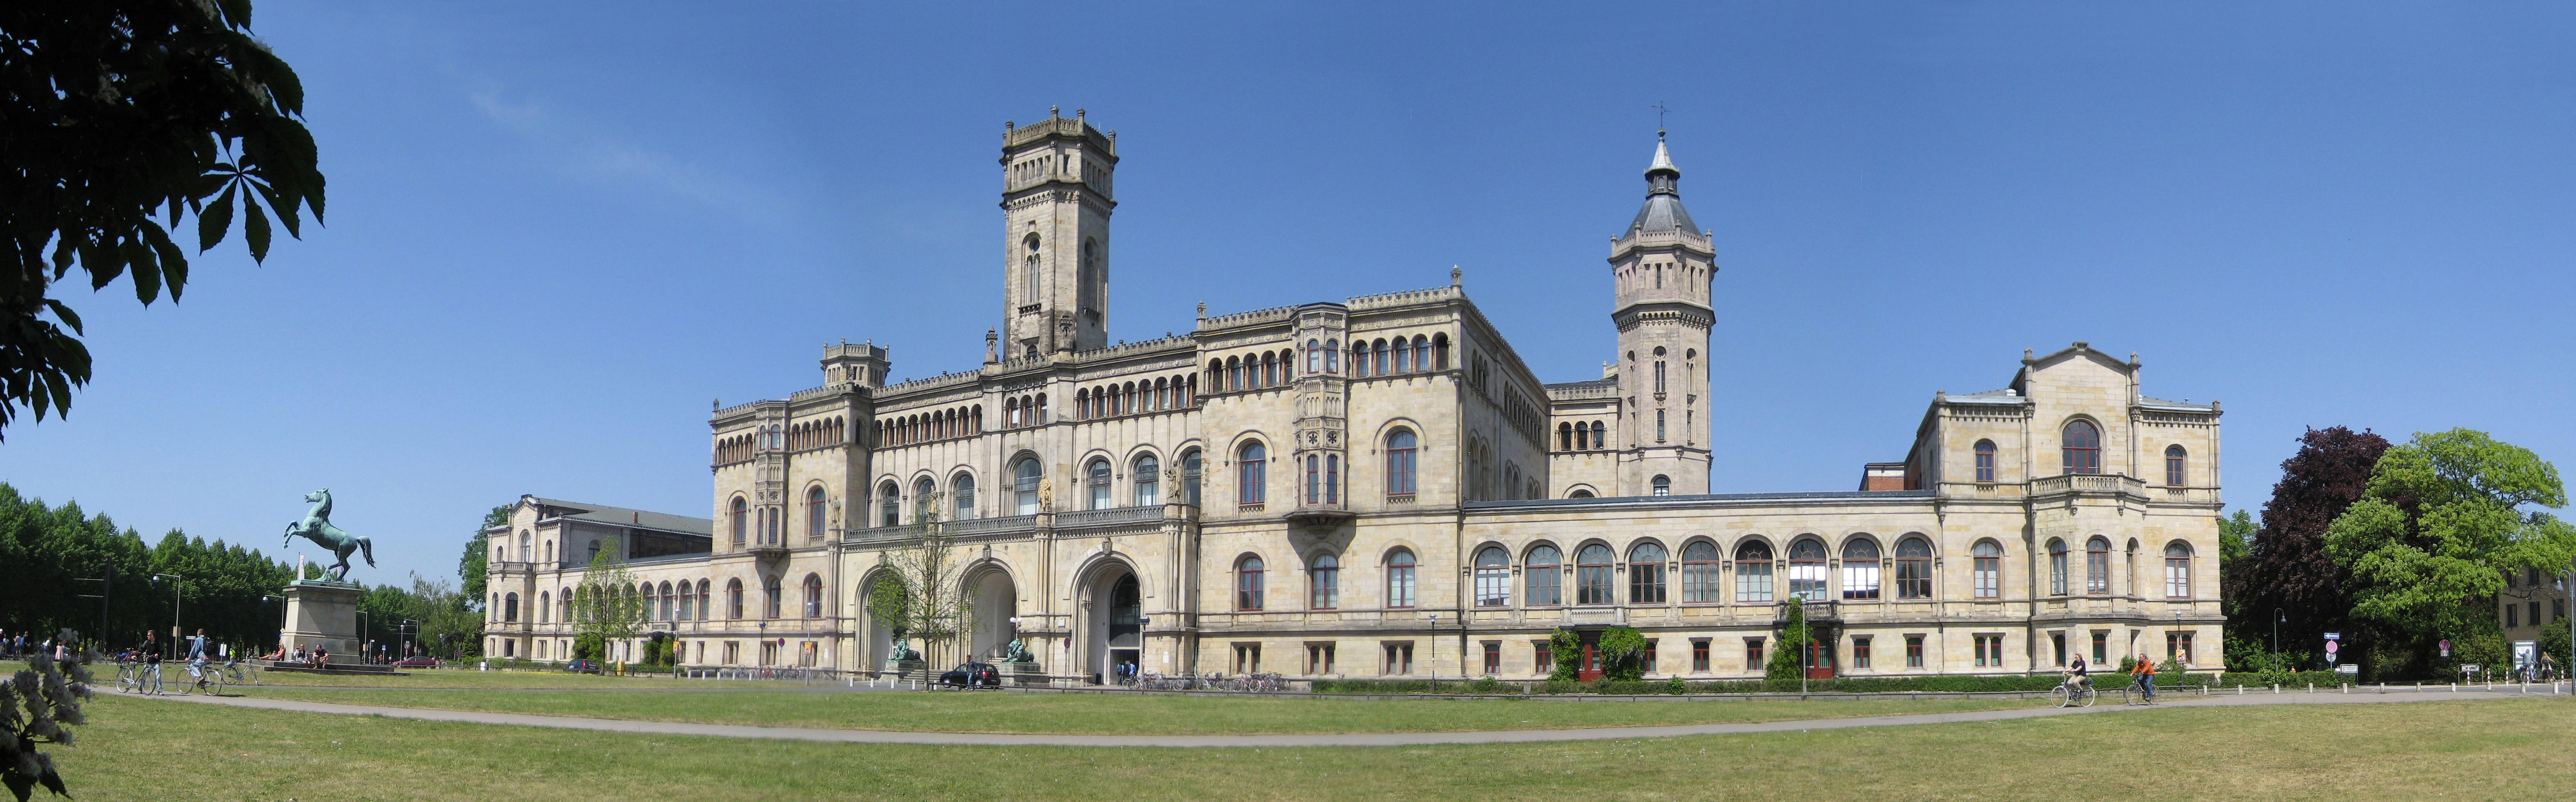 File:Universität Hannover - Hauptgebäude - B02.jpg ...